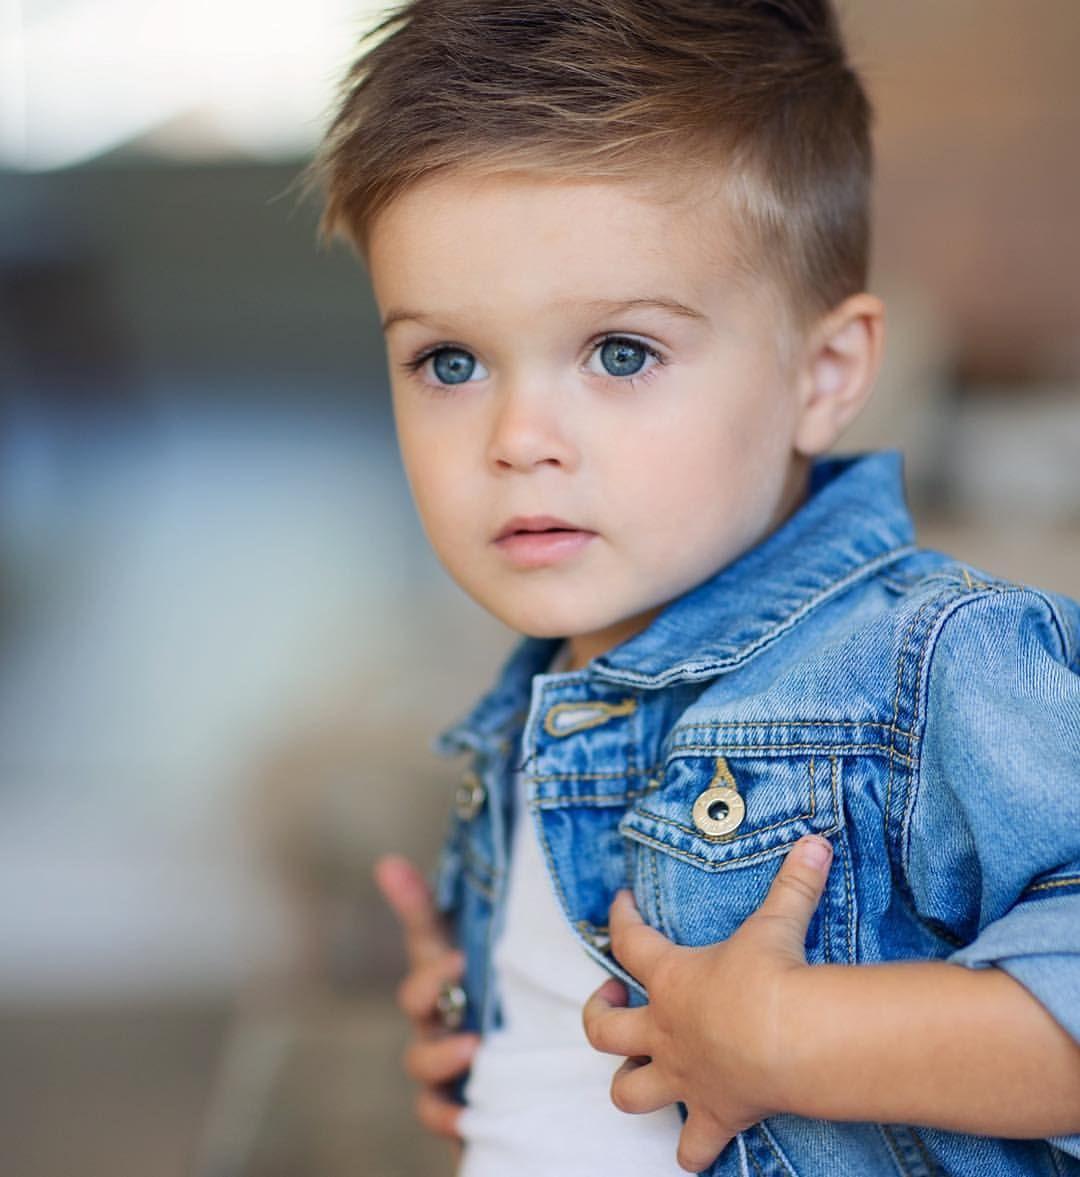 jungen haarschnitt kleinkind - trends frisuren